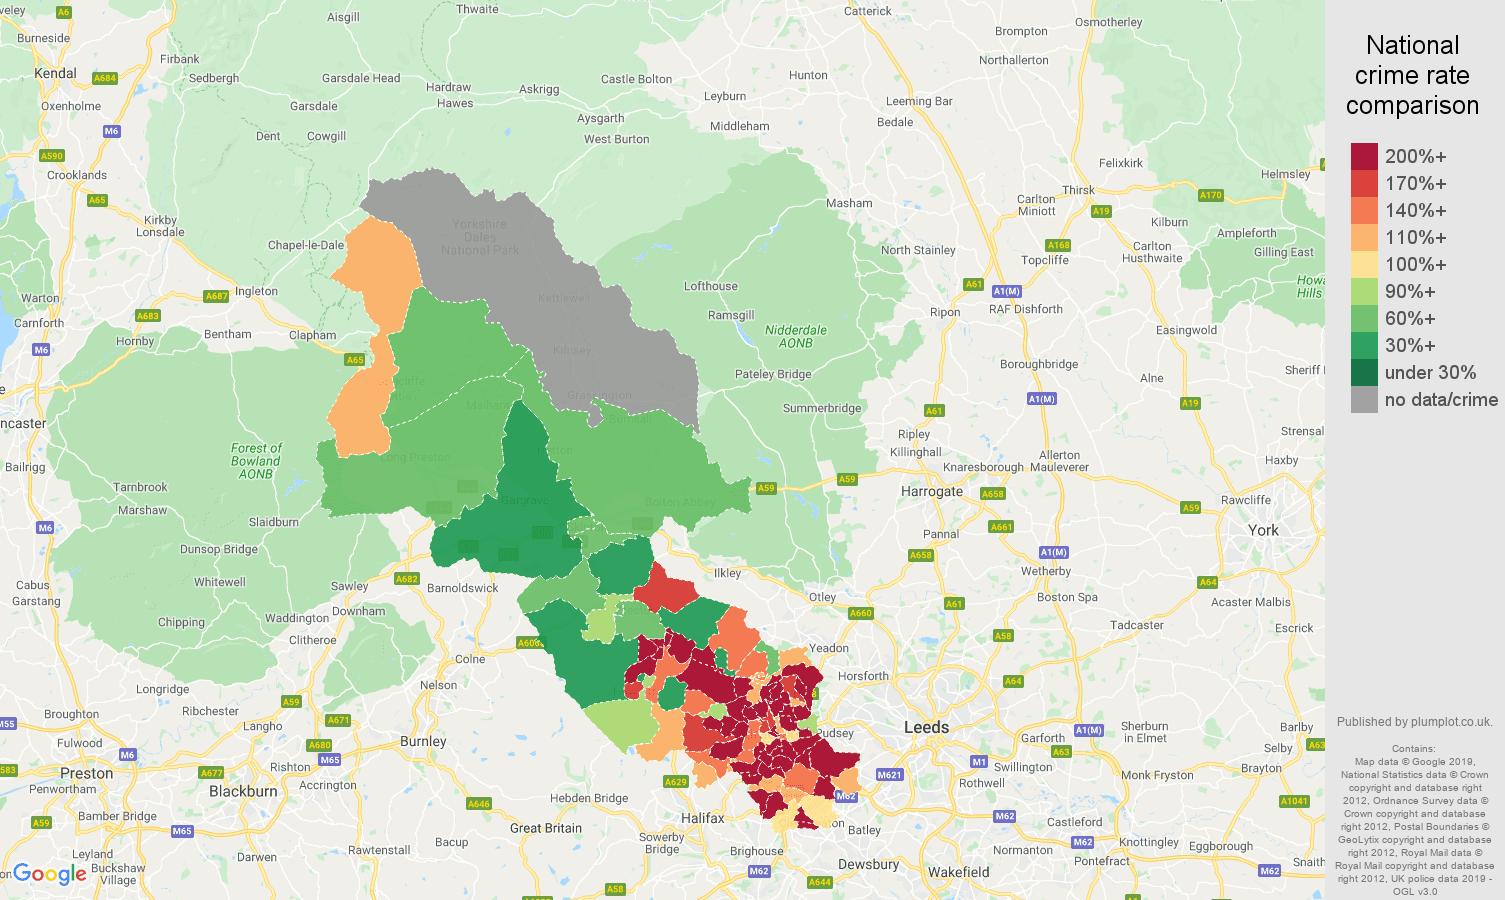 Bradford other crime rate comparison map